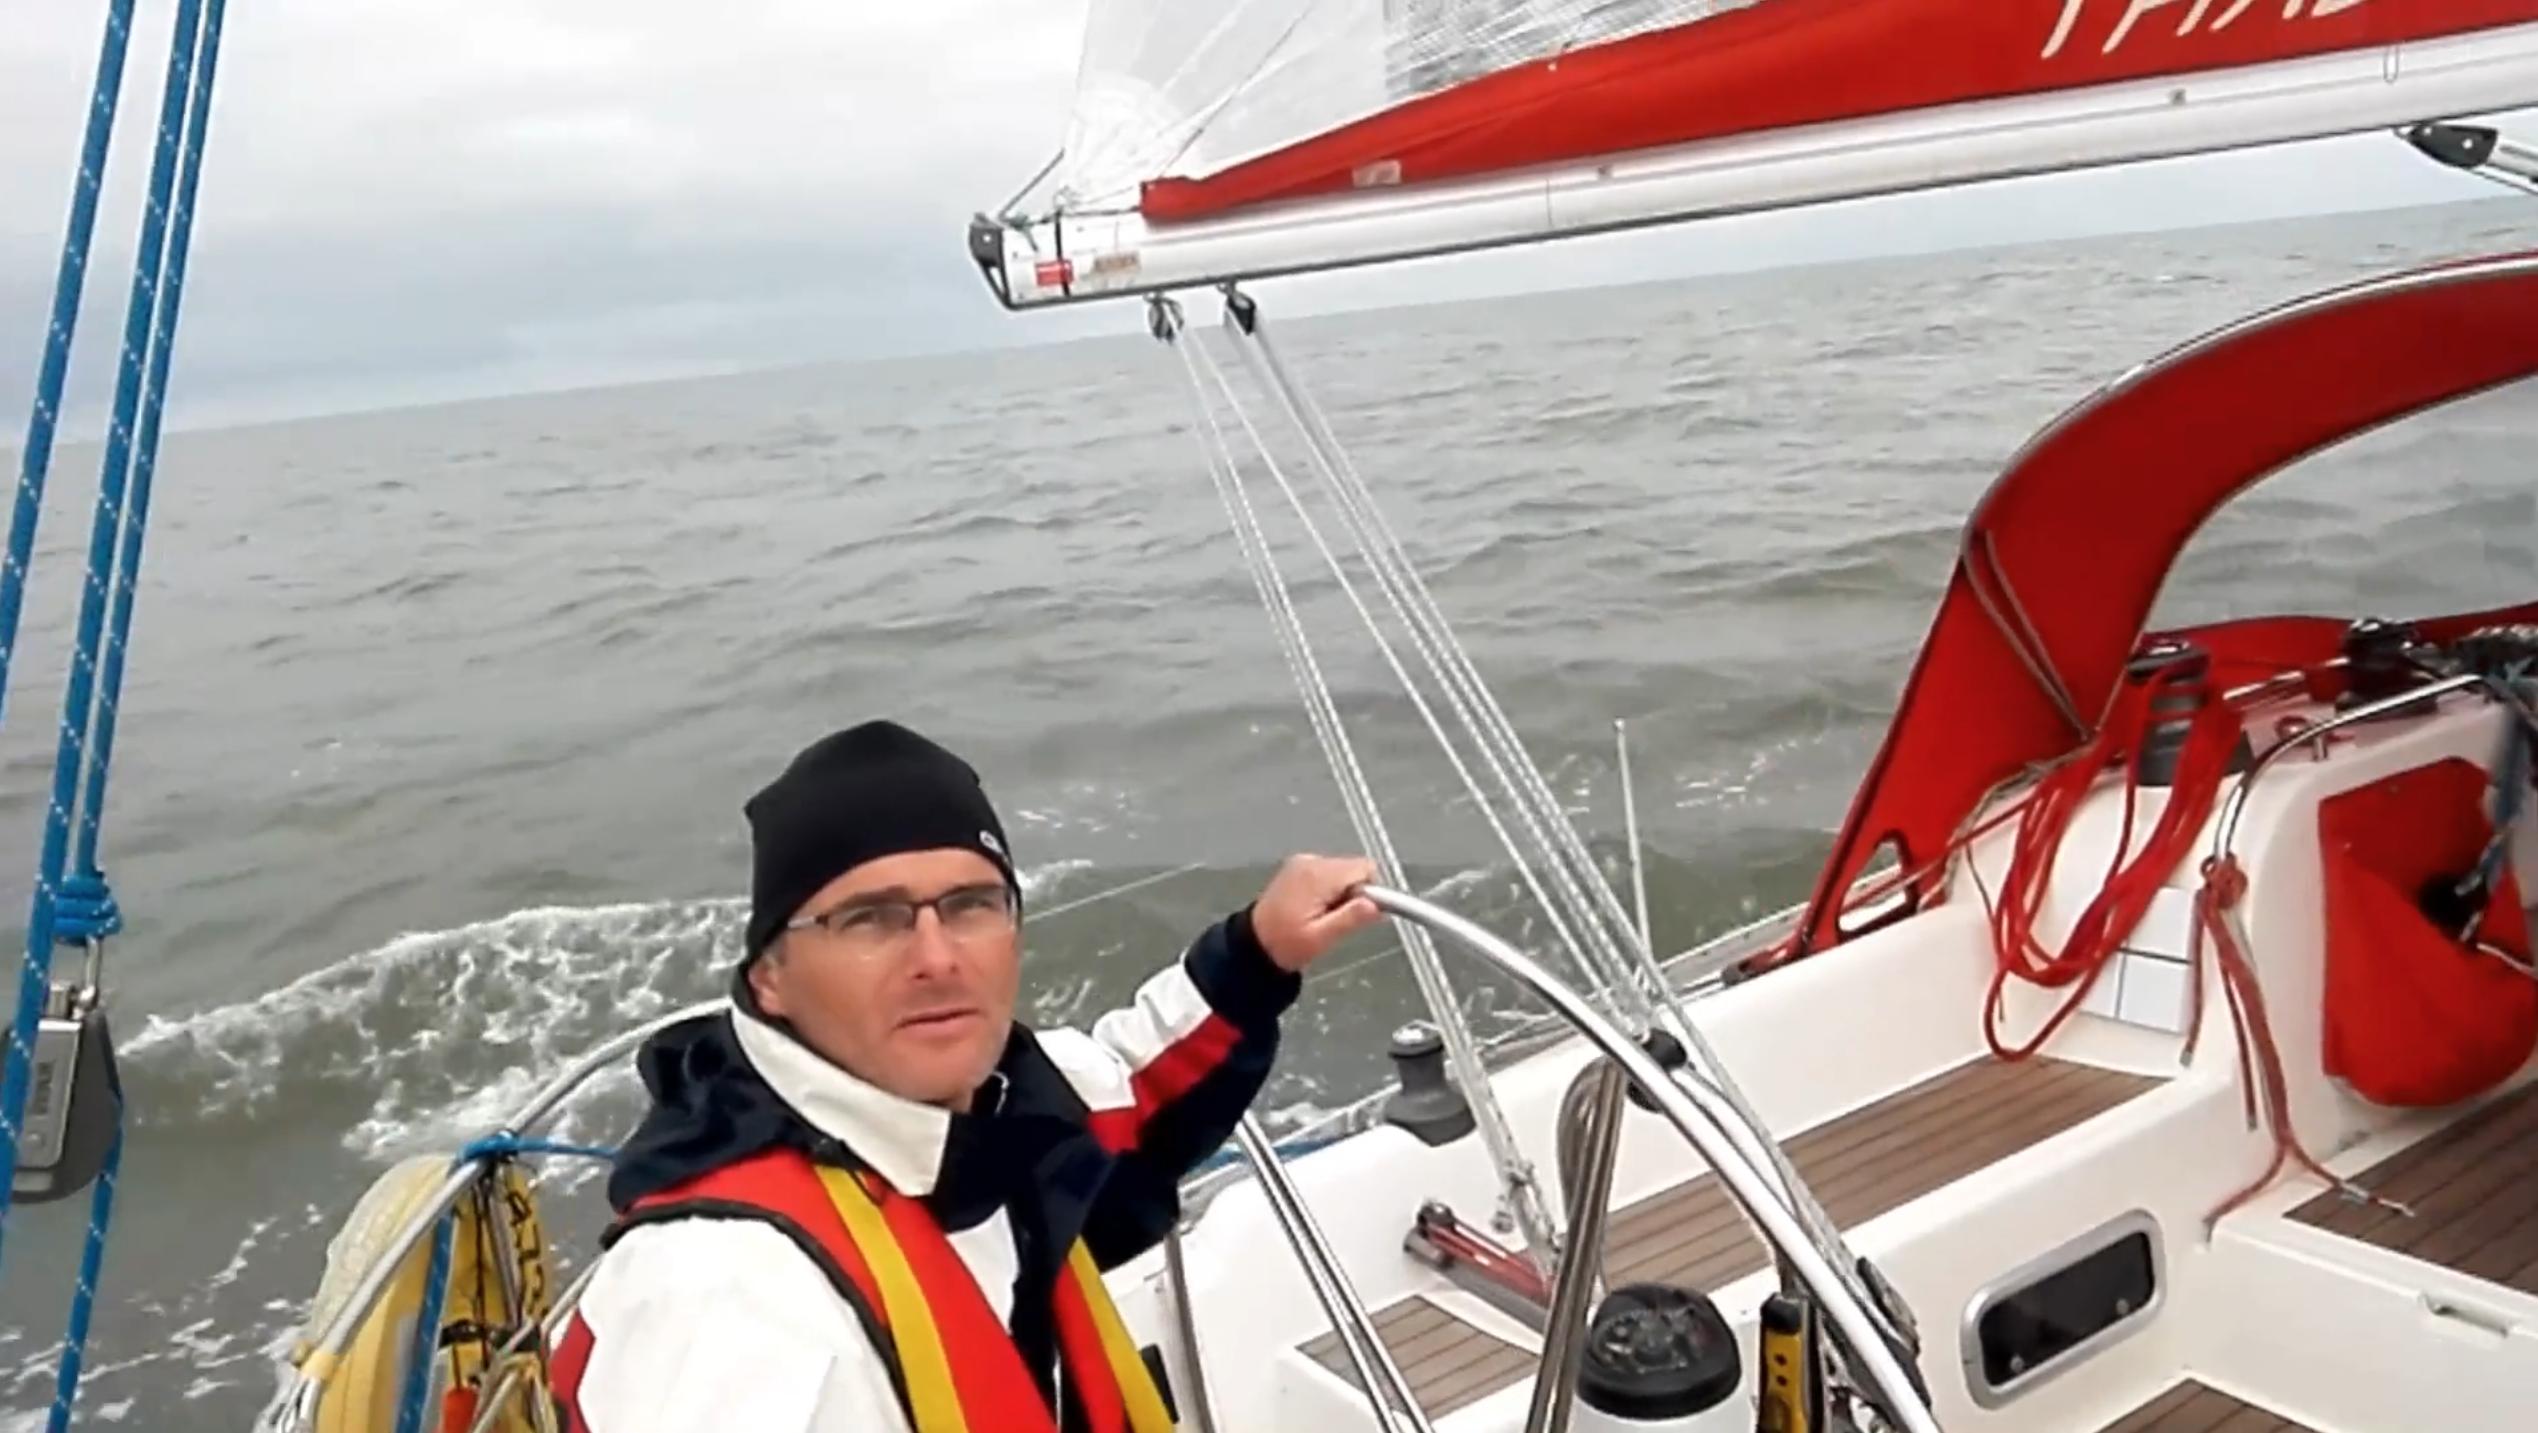 Piotr Kapustka Offshoreadventure Akademia Żeglarstwa i Nurkowania